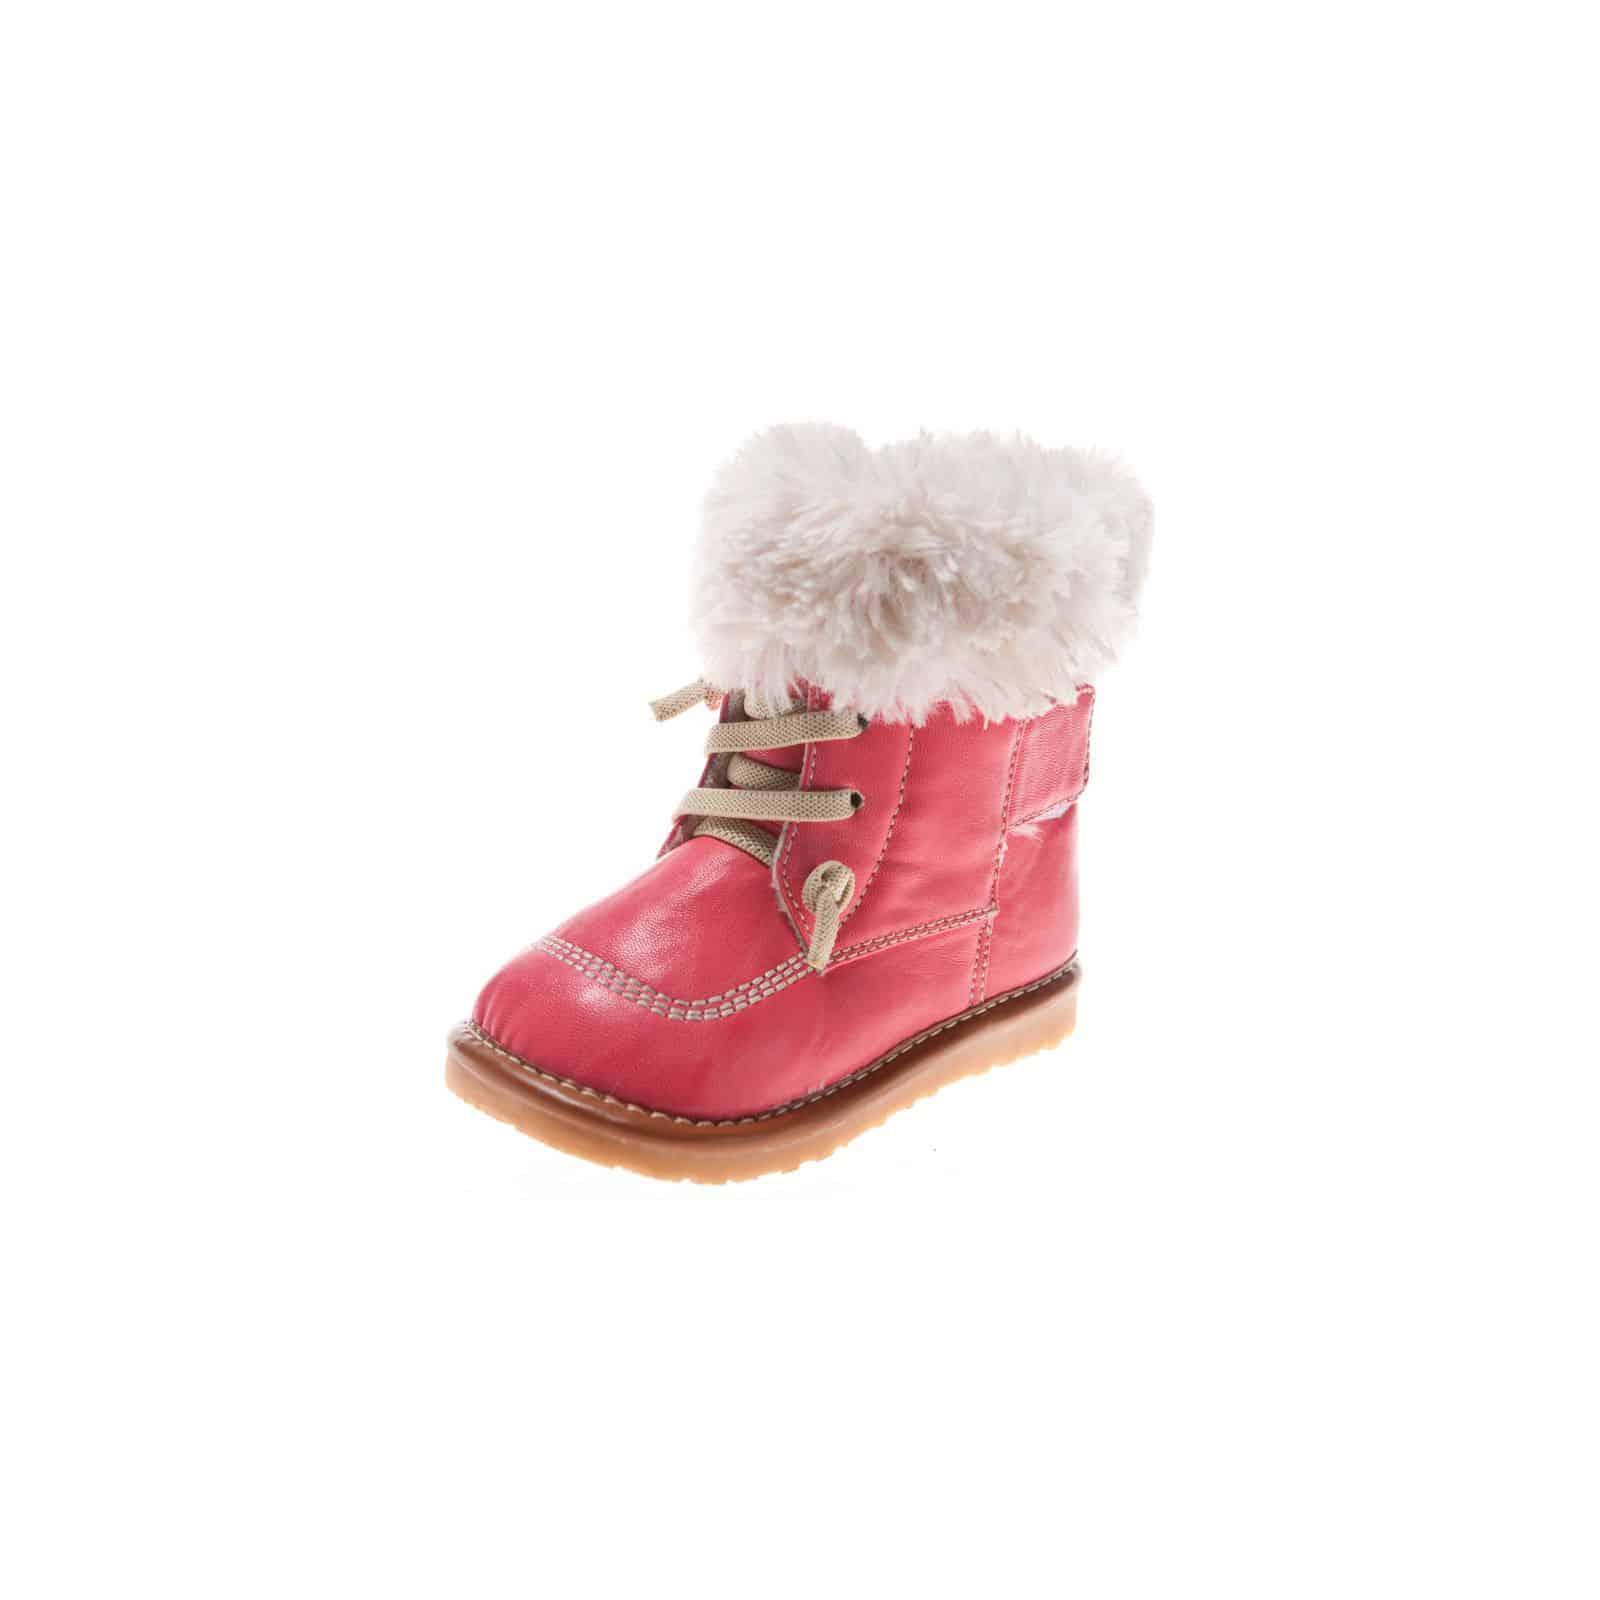 Little Blue Lamb - Zapatillas de material sintético para niño, color rosa, talla 20